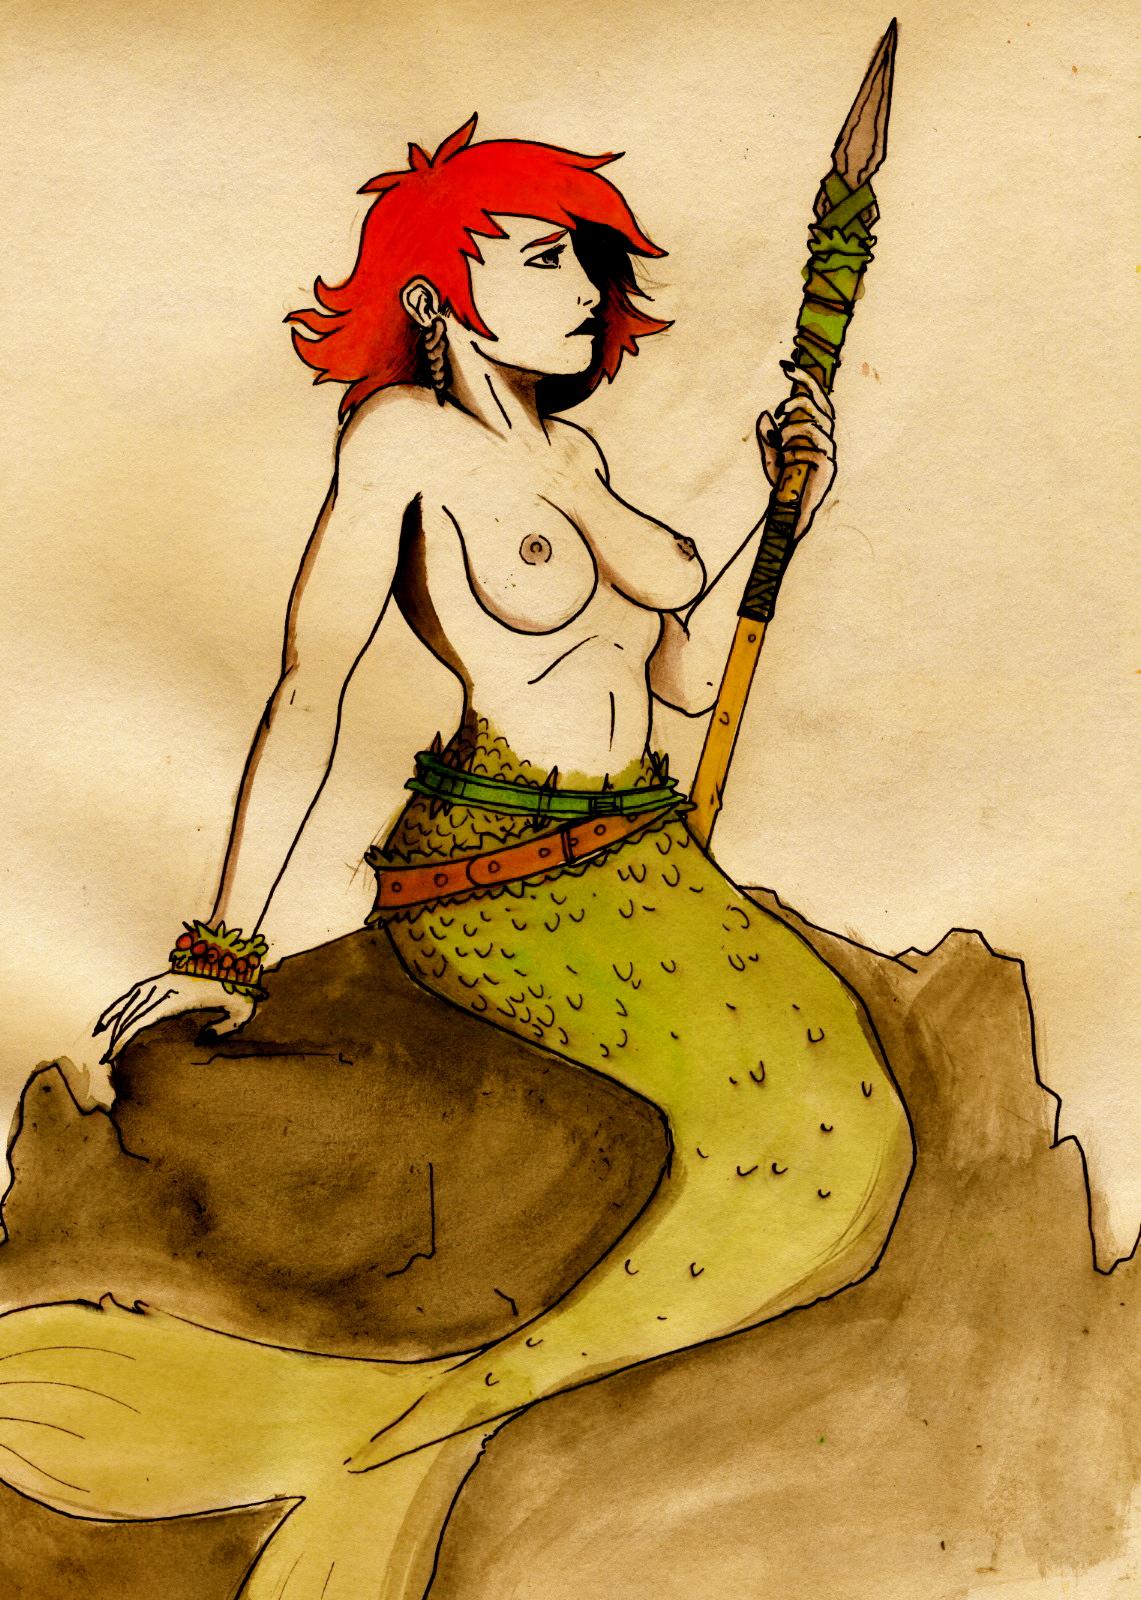 the original little mermaid